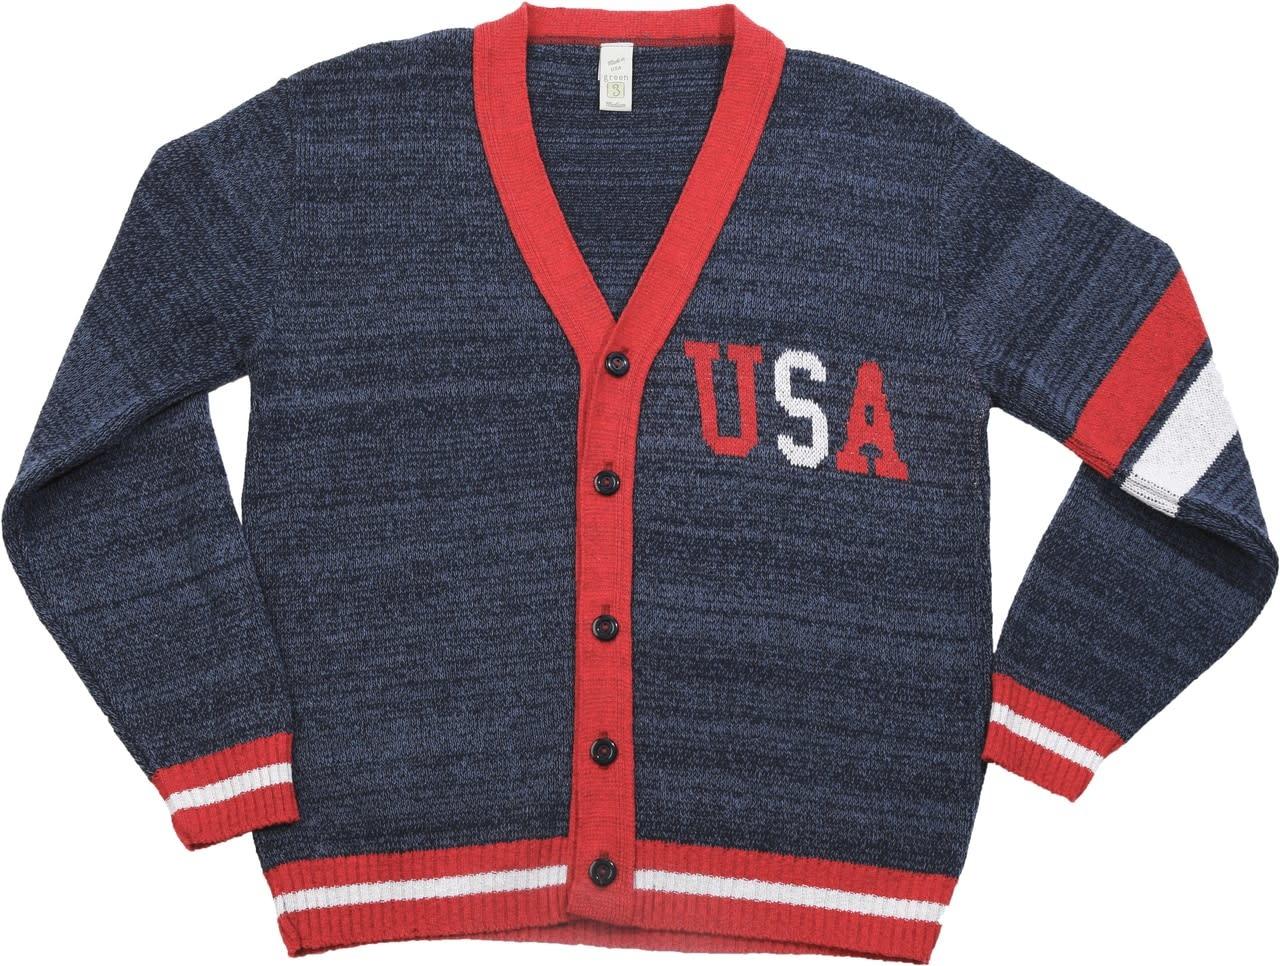 Green 3 Apparel American Letterman Sweater